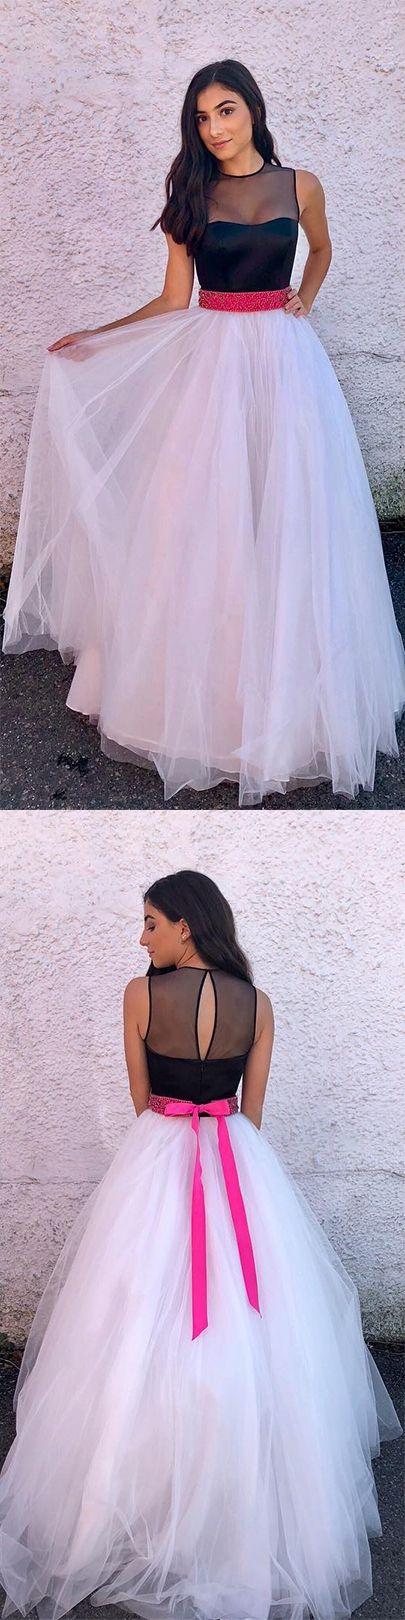 Elegant Prom Gown,Black and White Prom Dresses,Tulle Evening Dress,Long Prom Dress,Open Back Prom Dresses,Evening Dress,Formal Women Dress #tulle #blacktop #prom #prom #okdresses